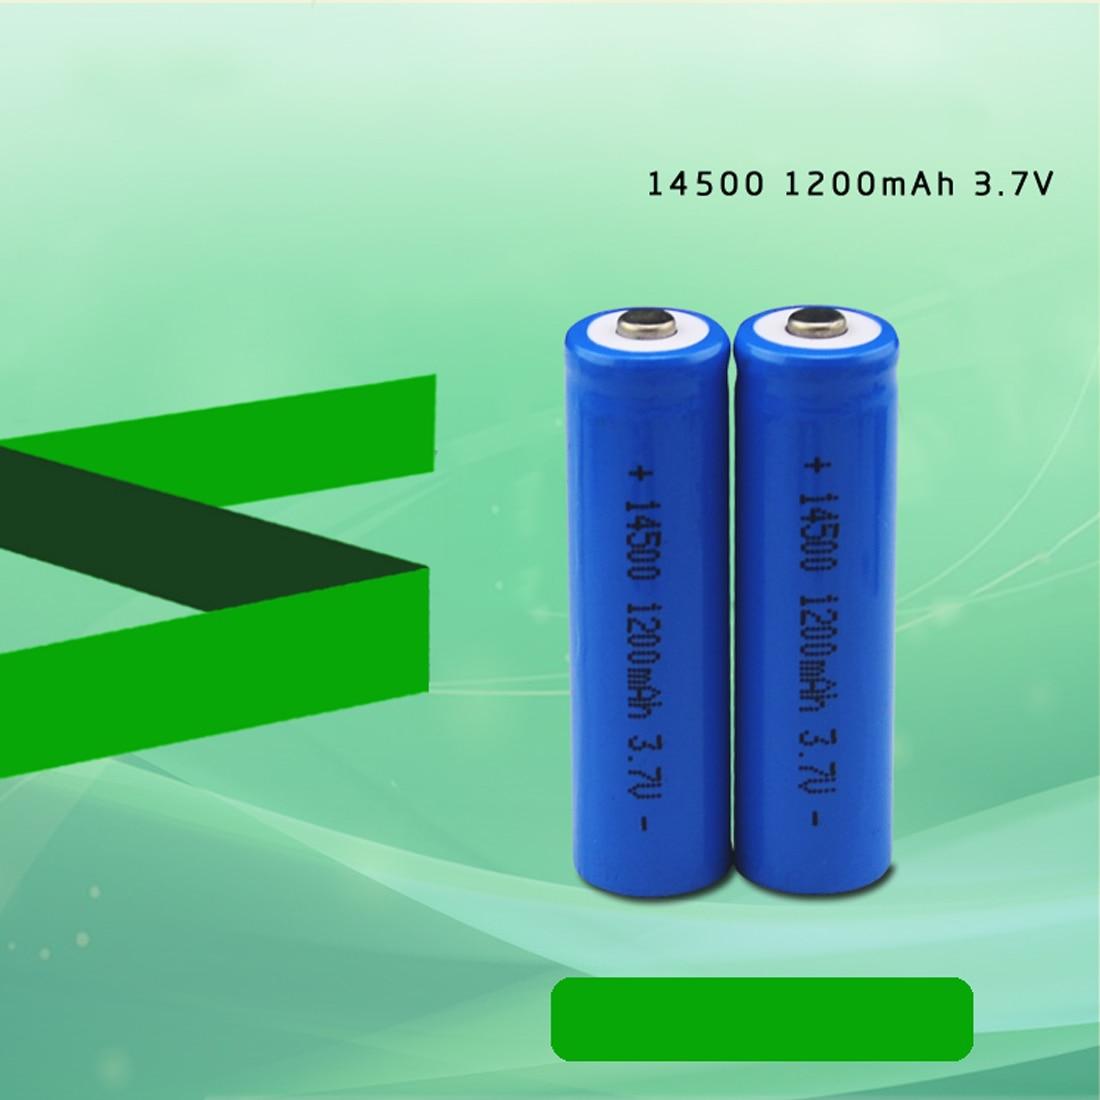 centechia 4 pcs Capacitance 14500 Battery 3.7V 1300mAh Rechargeable Battery for Led Flashlight Batery Battery Newest